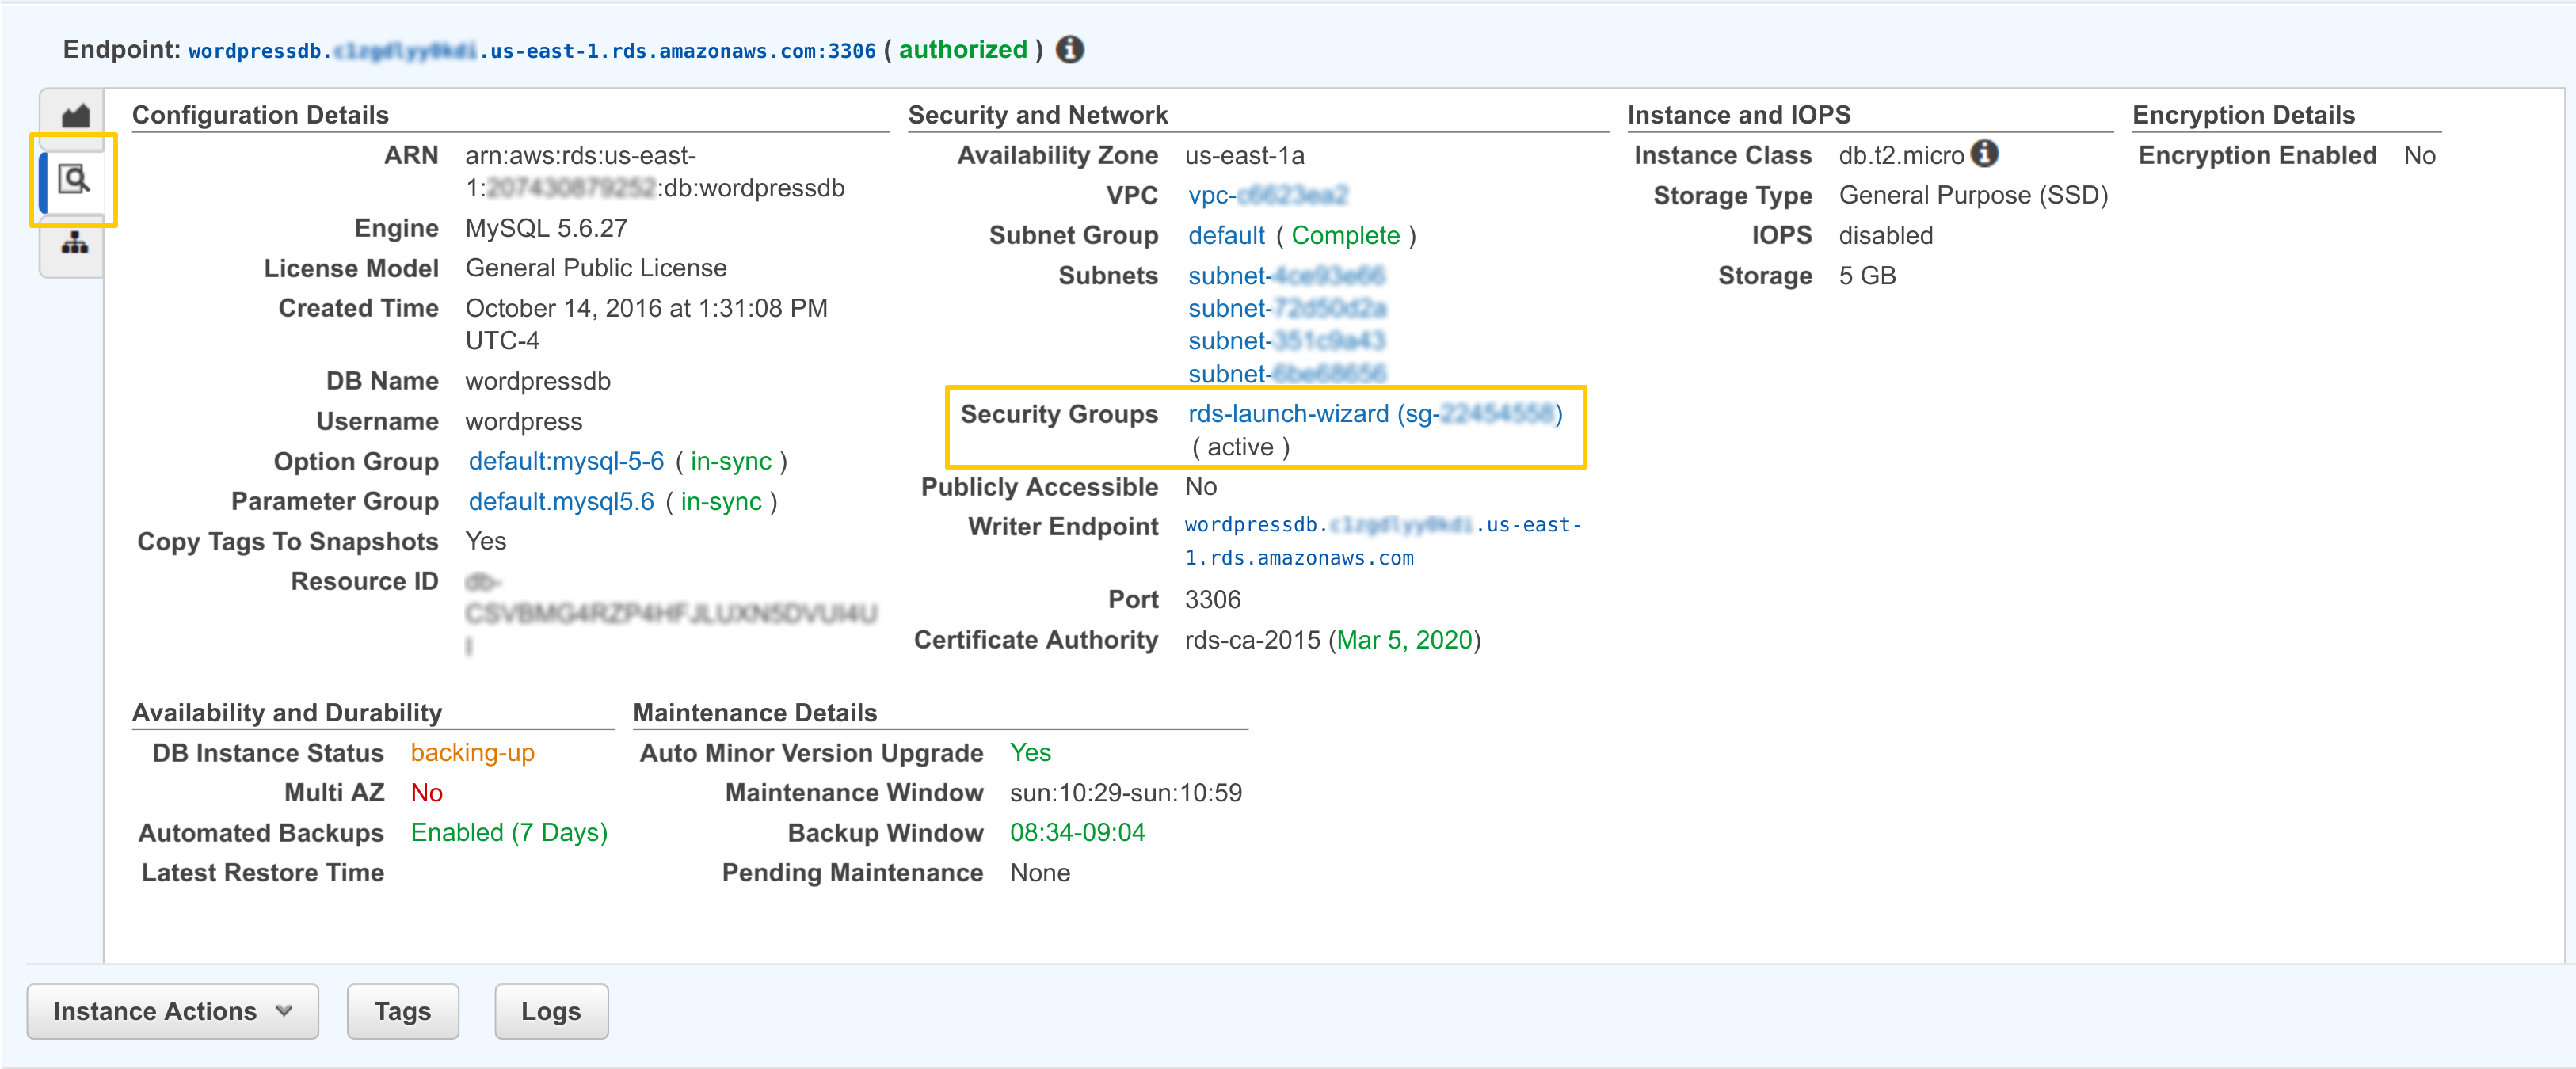 Elastrix Cloud Computing Blog | Setting up an external RDS database